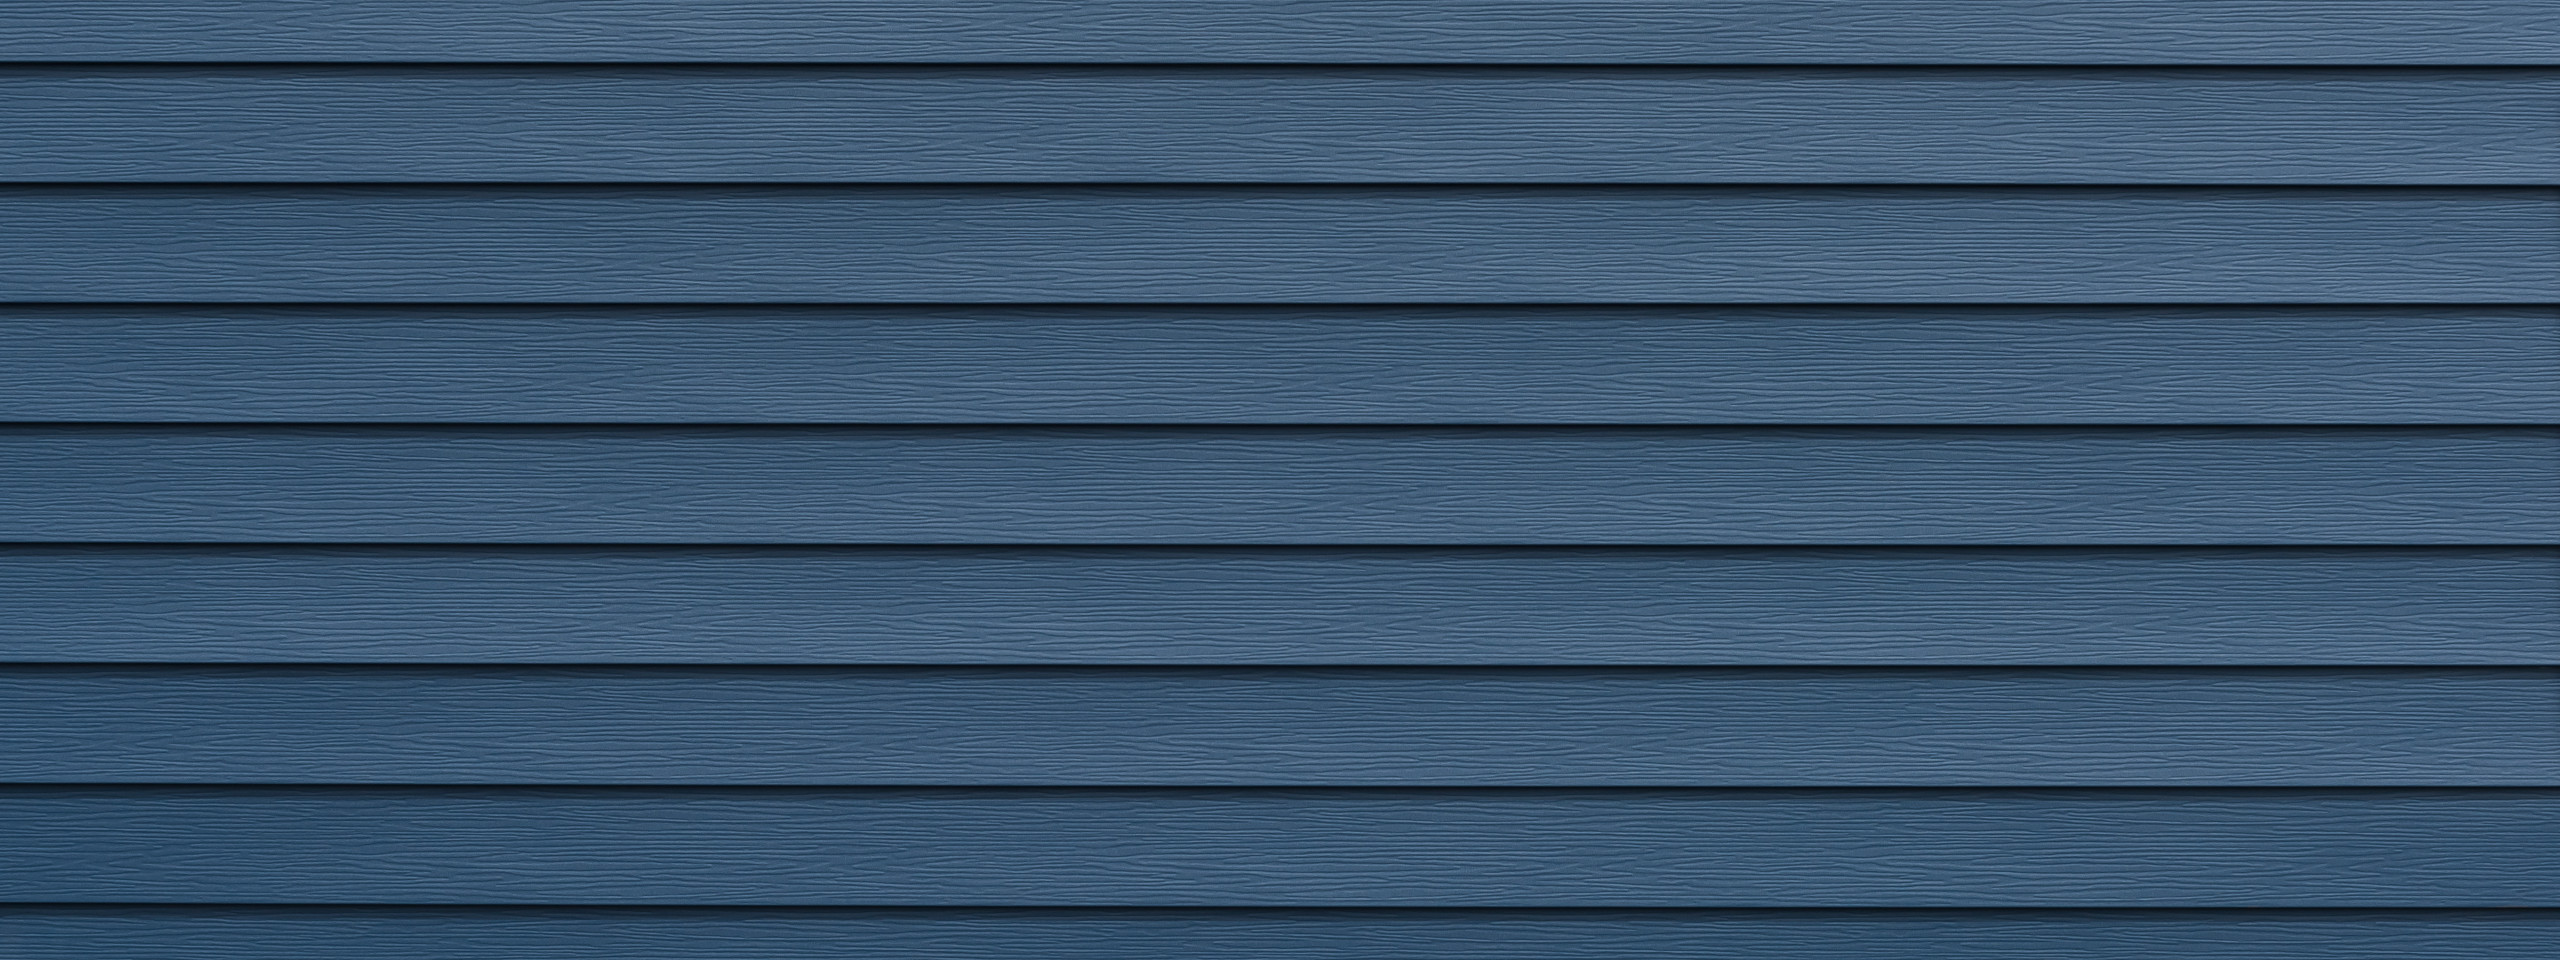 Prism Horizontal Blue